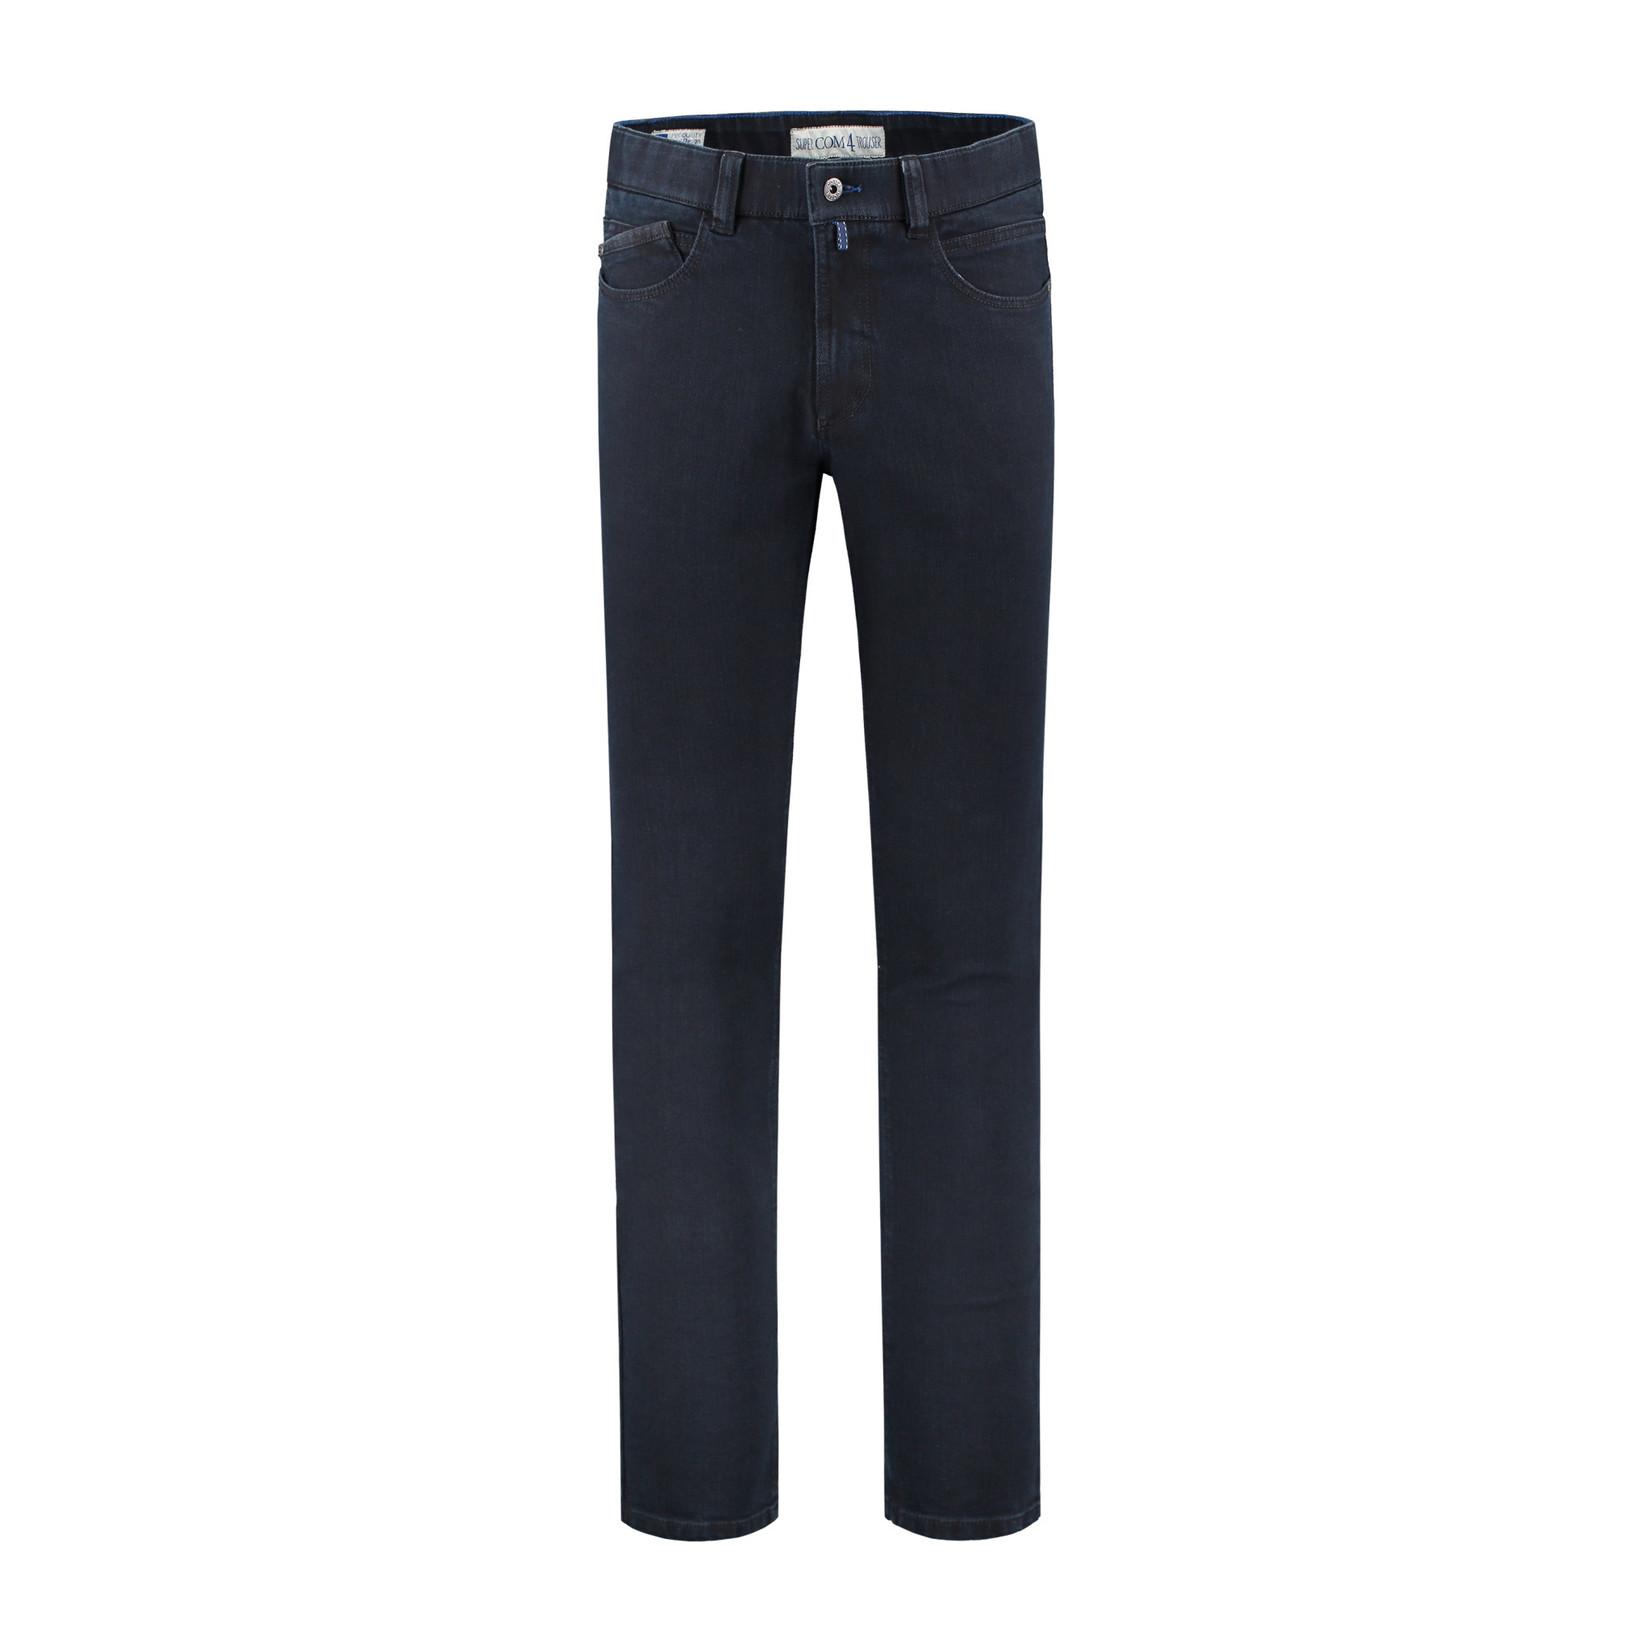 Com4 Urban jeans donkerblauw 2170-3601